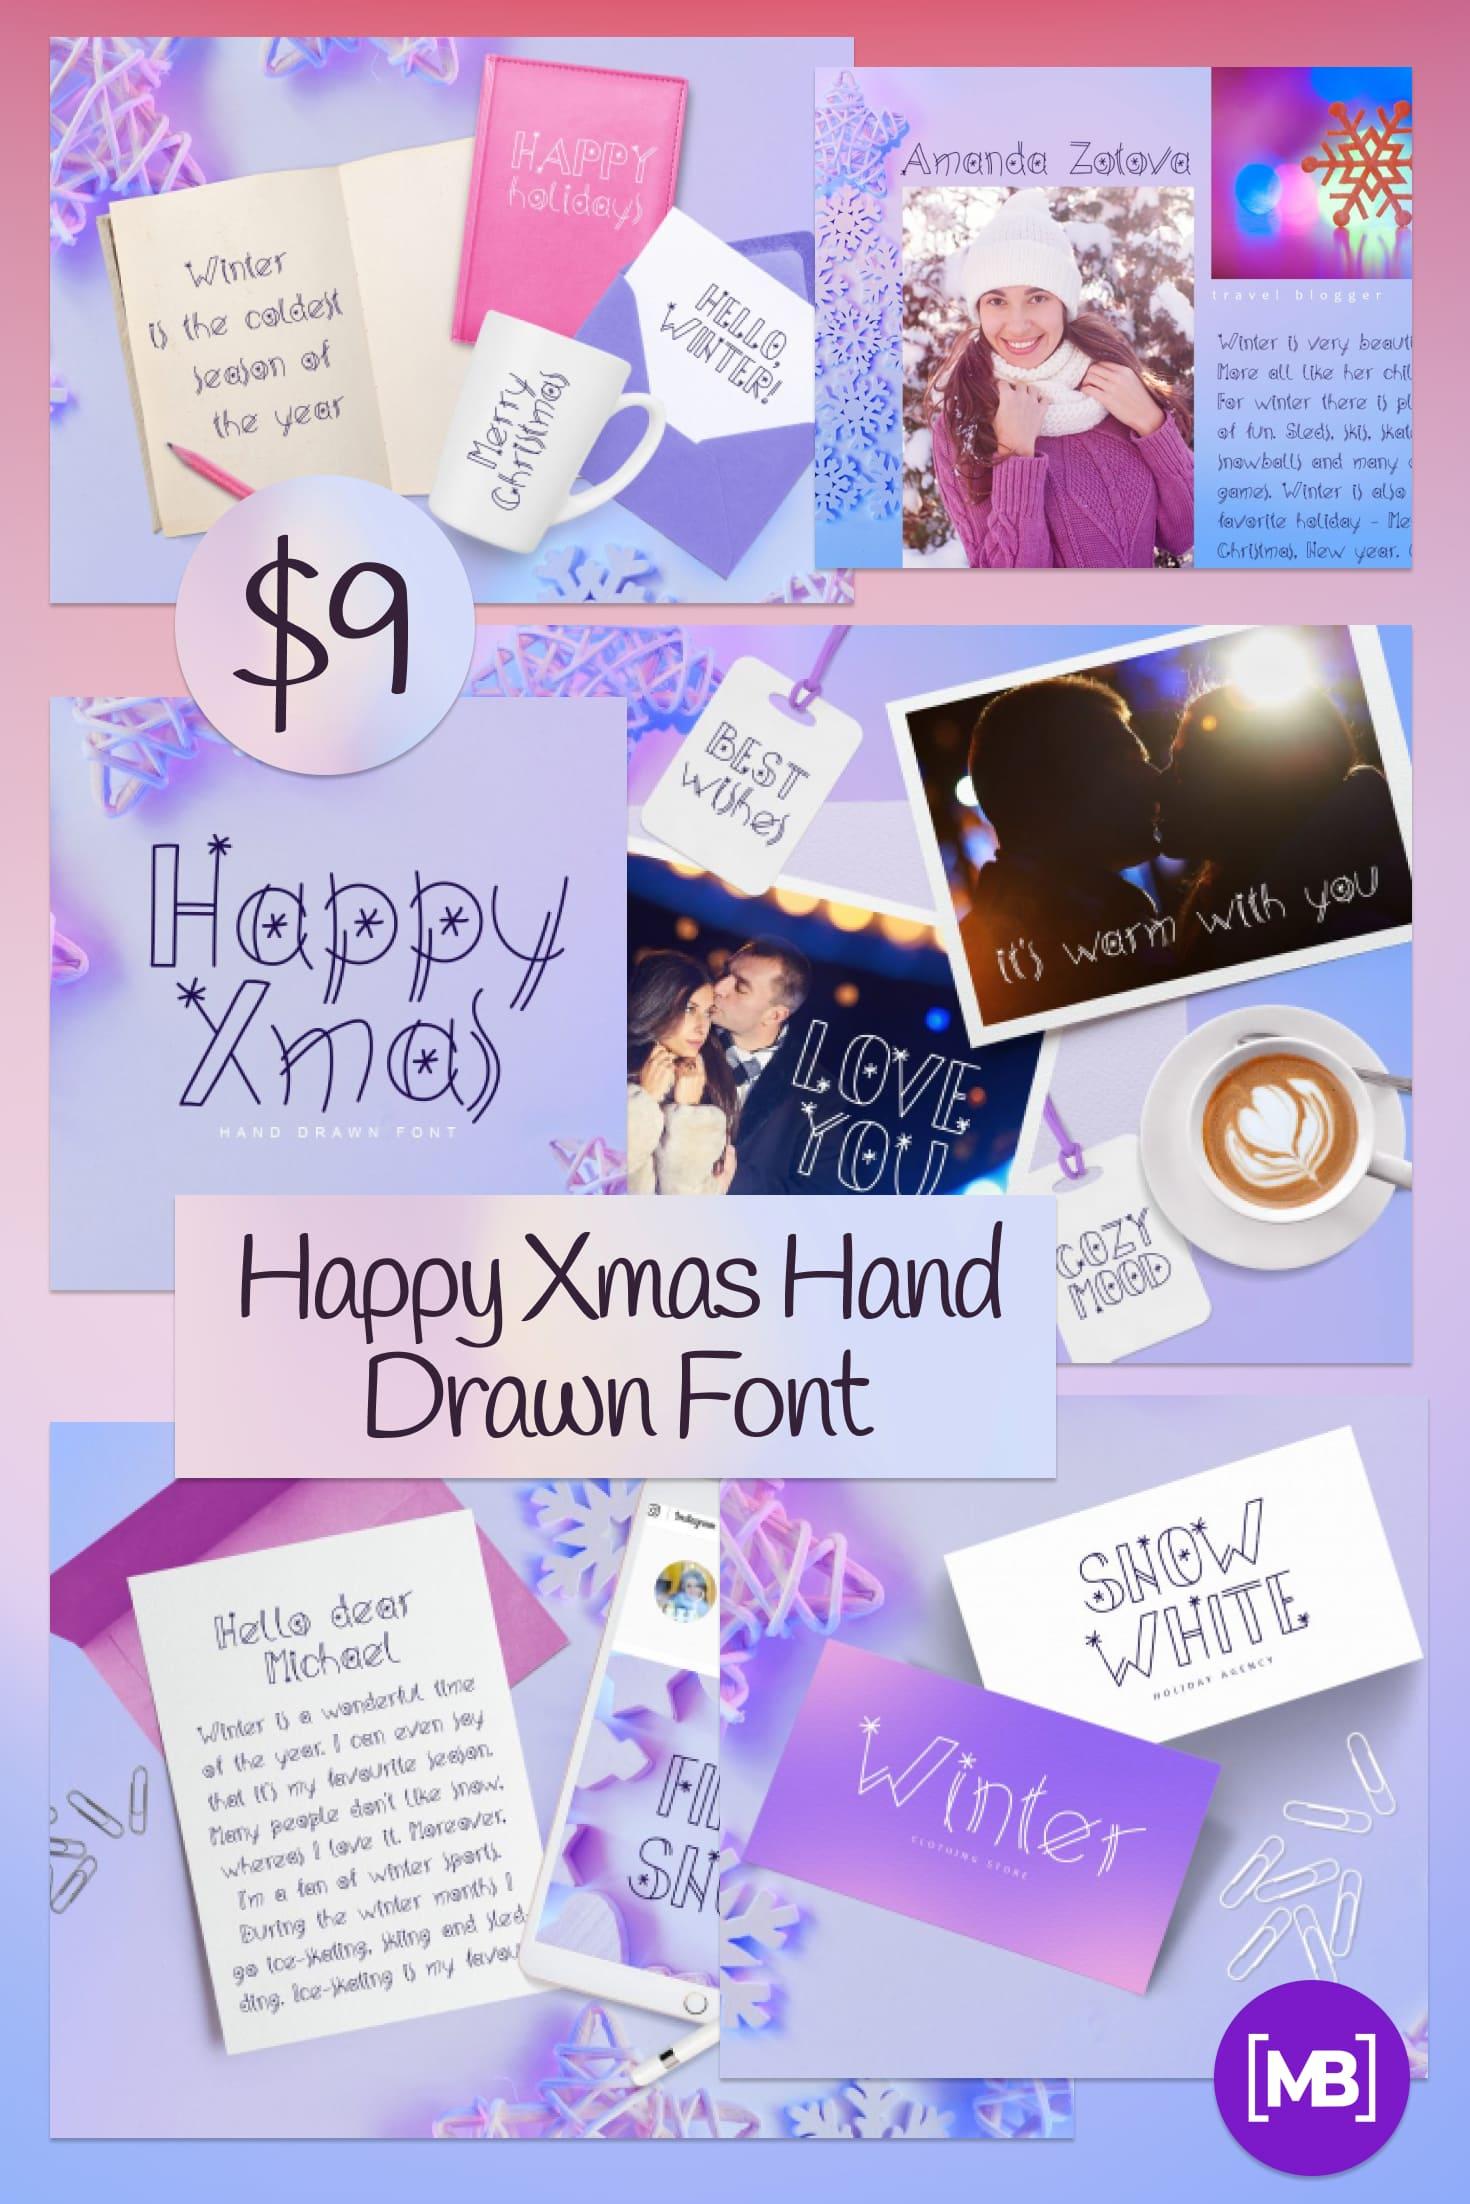 Pinterest Image: Happy Xmas Hand Drawn Font - $9.